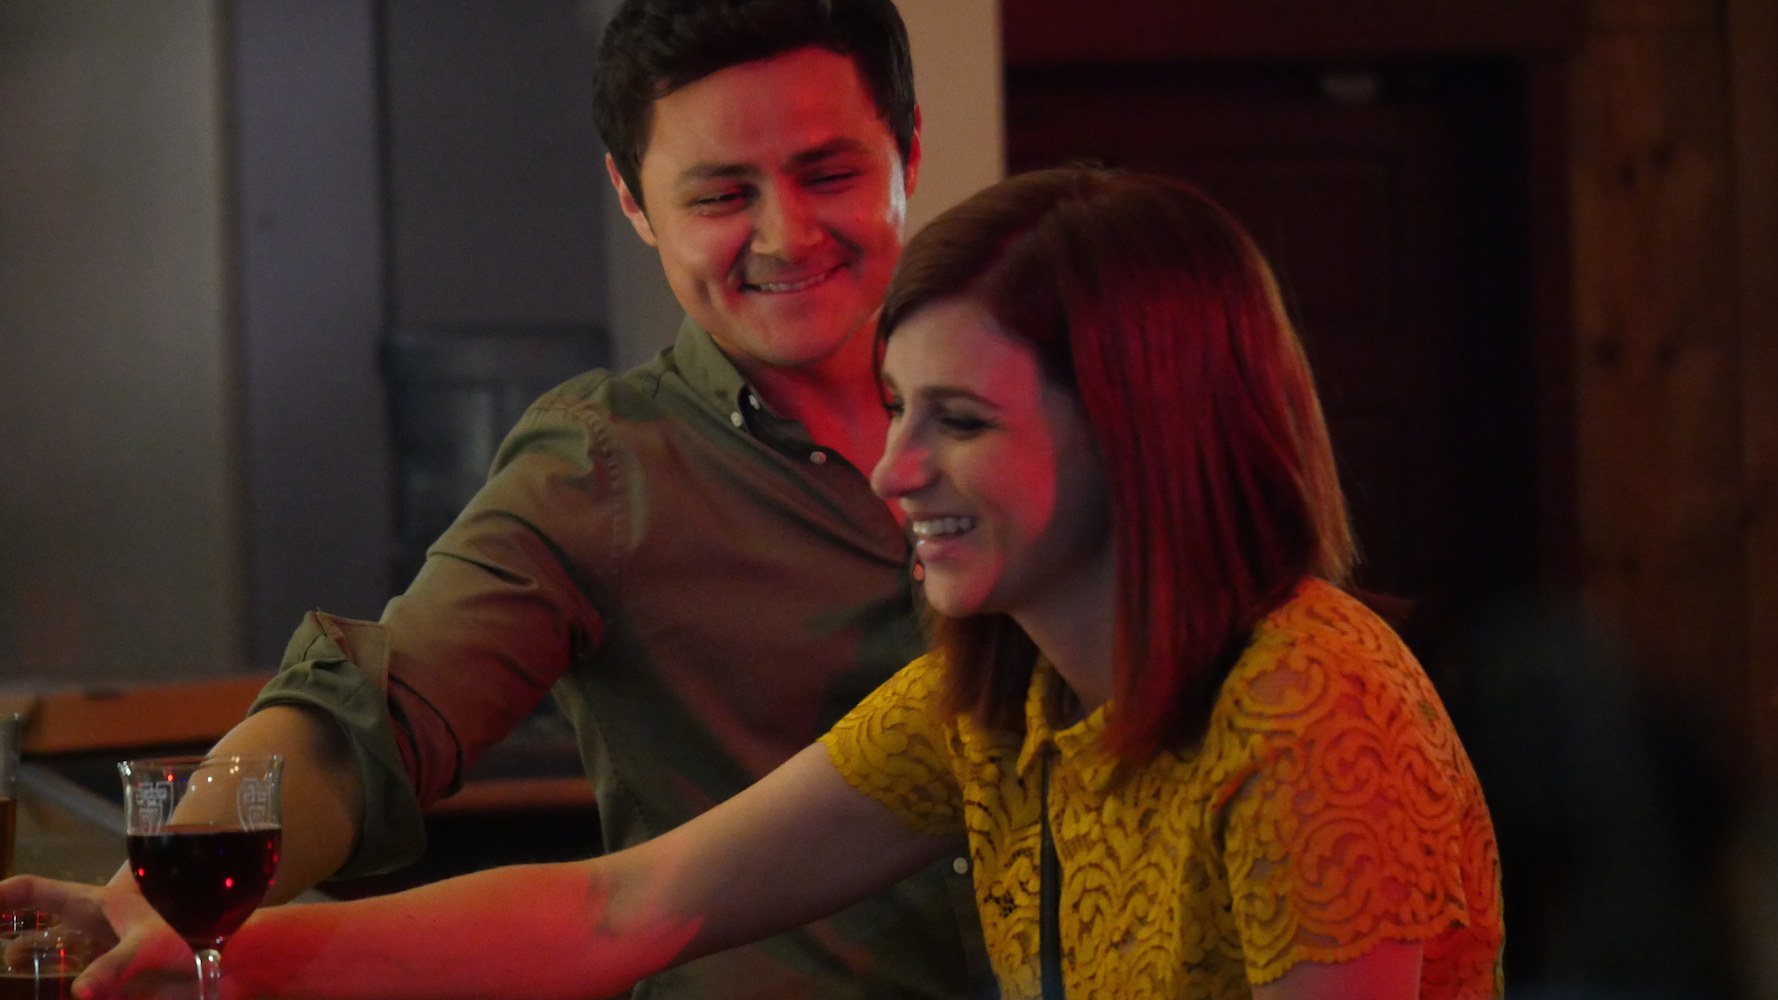 TRAILER: In This Rom-Com, Arturo Castro Follows Through on a High School Wedding Pact